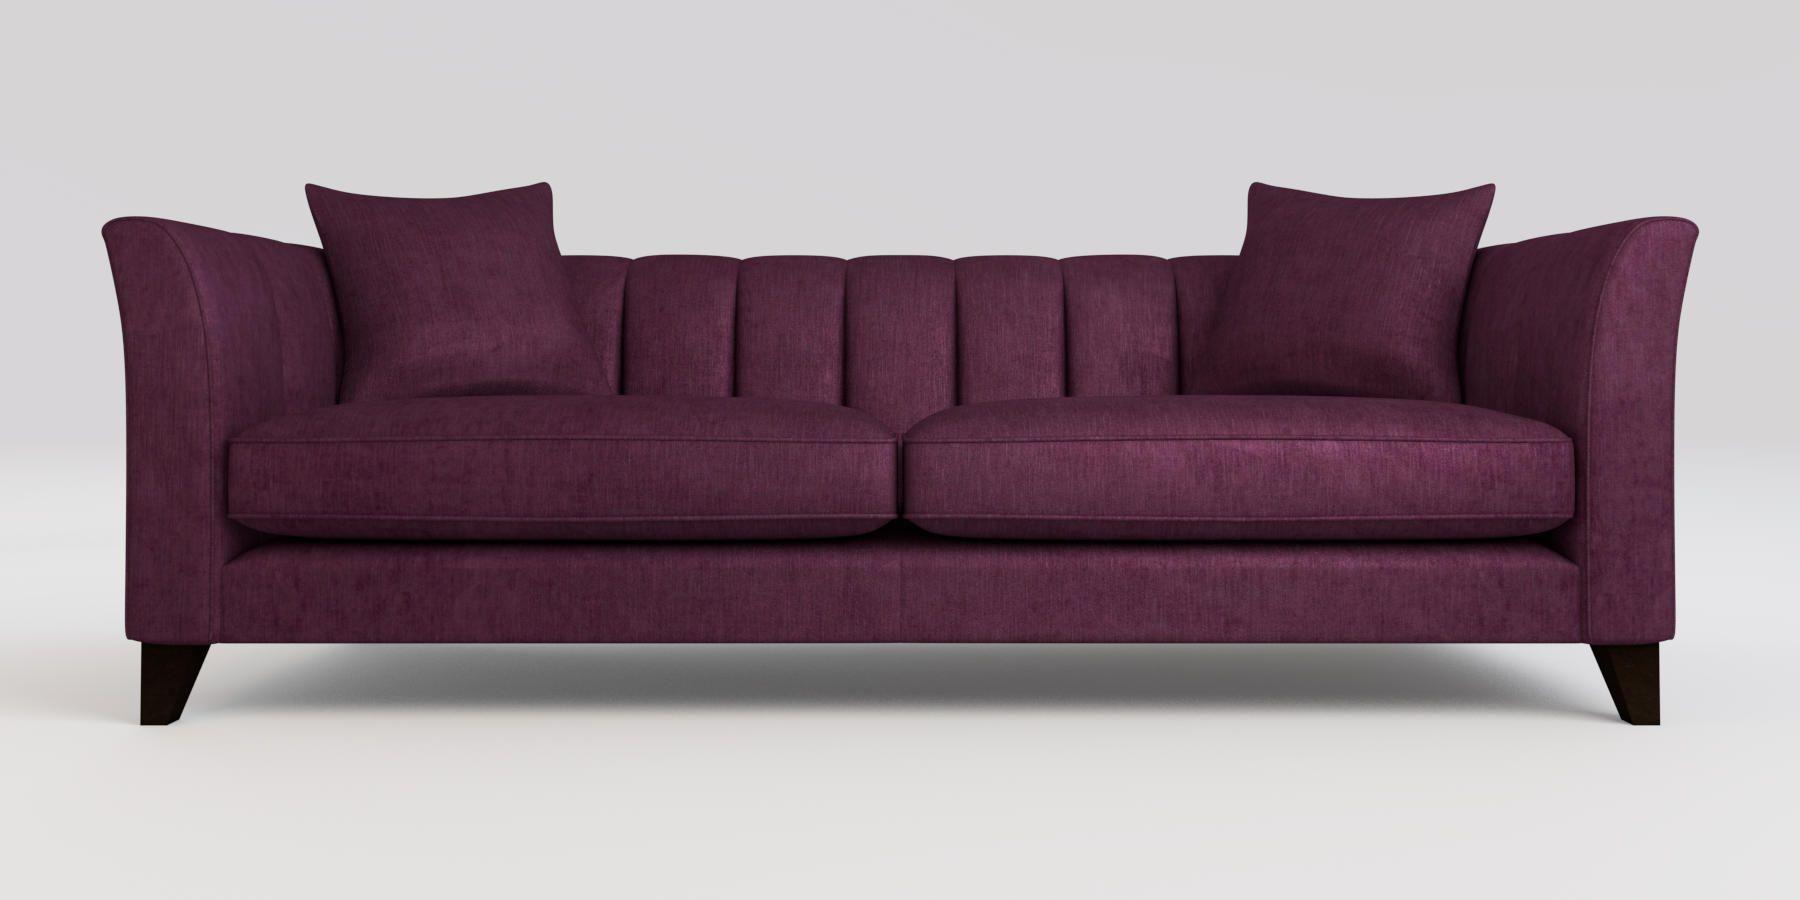 plum sofas uk ikea manstad corner sofa bed seats online michigan small 2 boucle weave